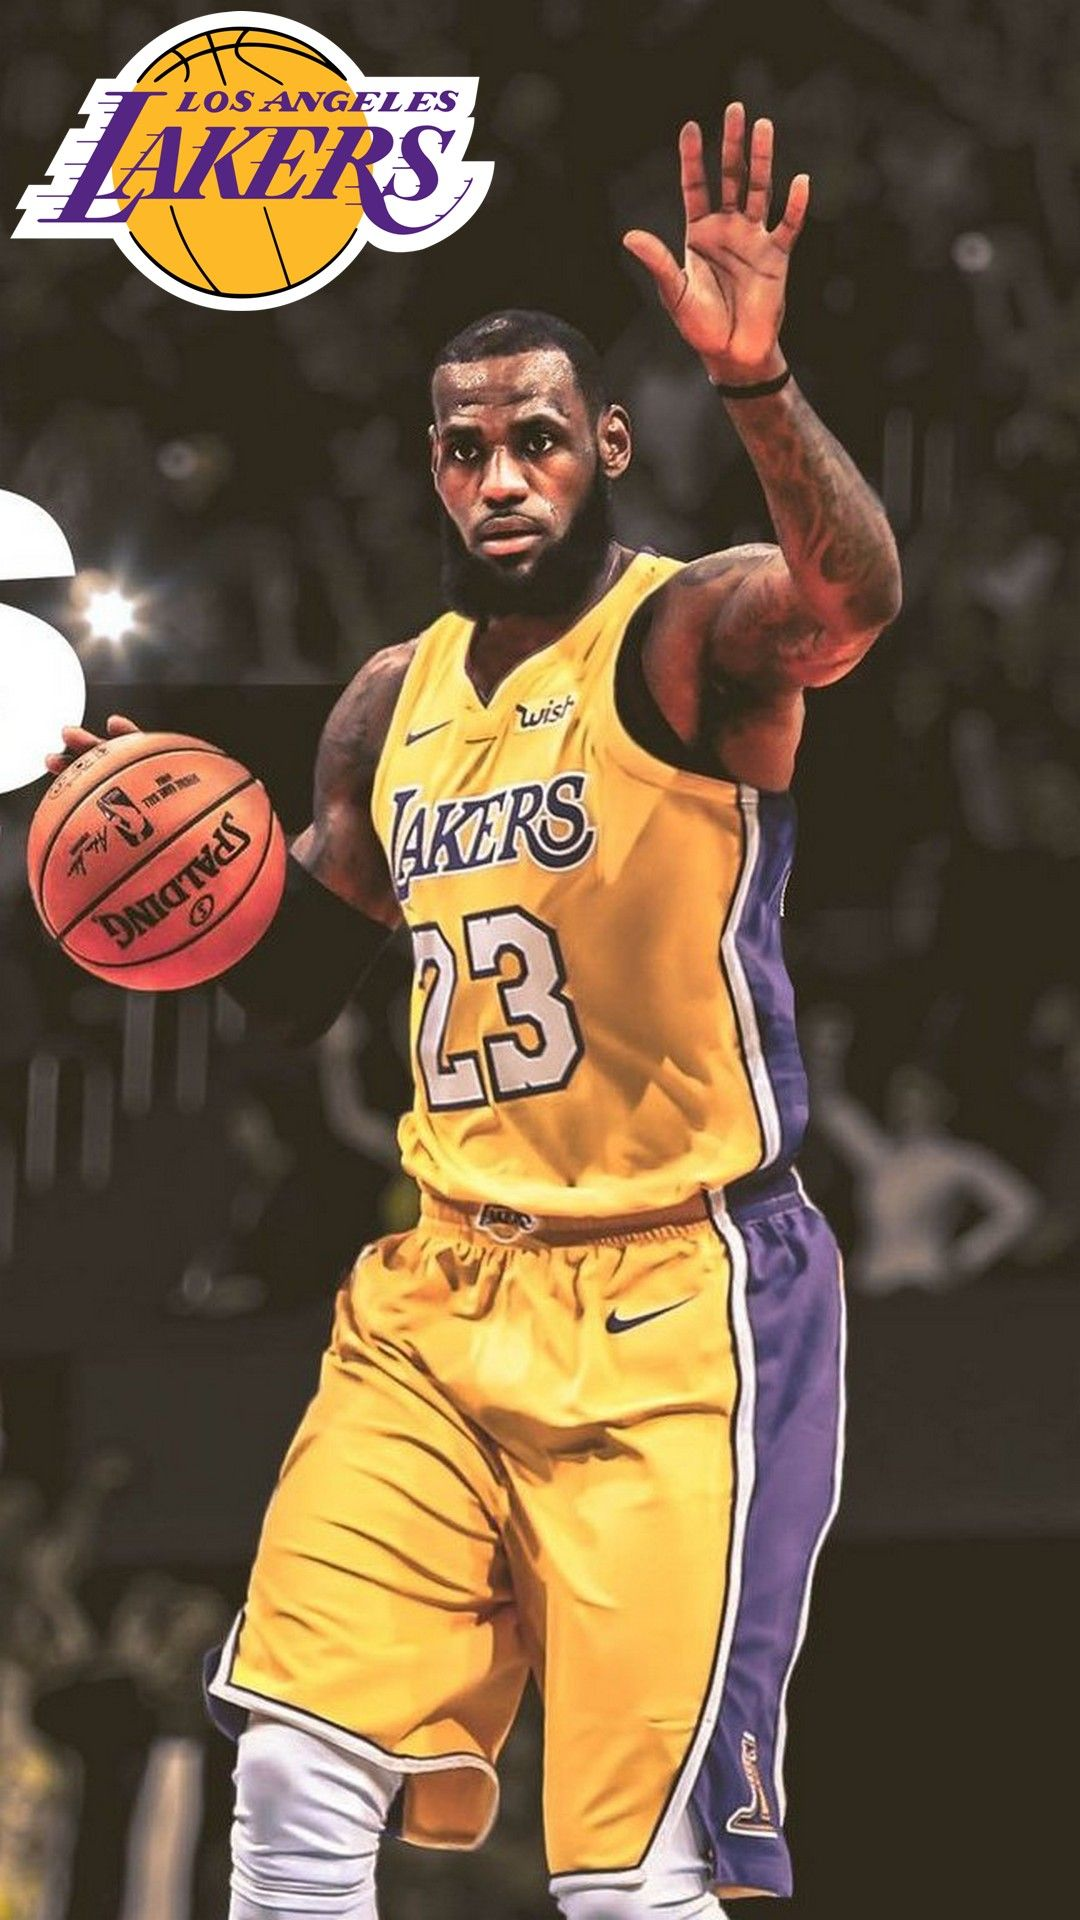 La Lakers Lebron James Hd Wallpaper For Iphone Lebron James